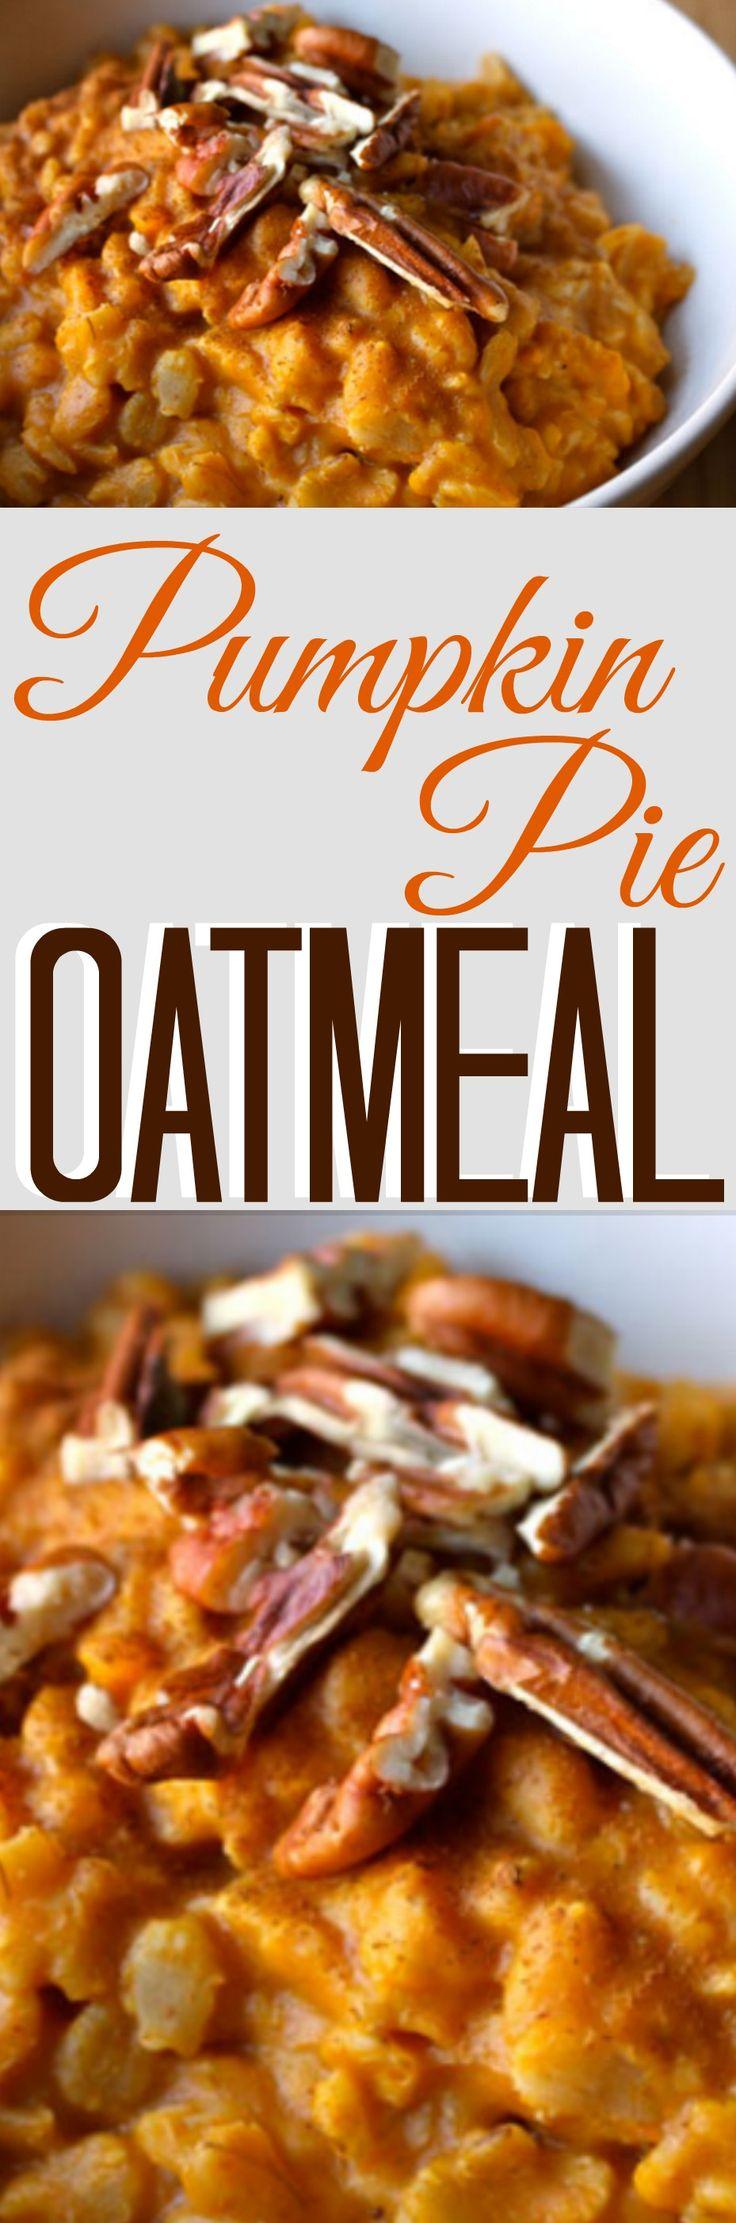 Healthy Pumpkin Pie Oatmeal #oatmeal #pumpkinpie #pumpkinoatmeal #pumpkinpiepoatmeal #healthyoatmeal #cleaneatingoatmeal #cleaneating #eatclean #breakfast #healthybreakfast